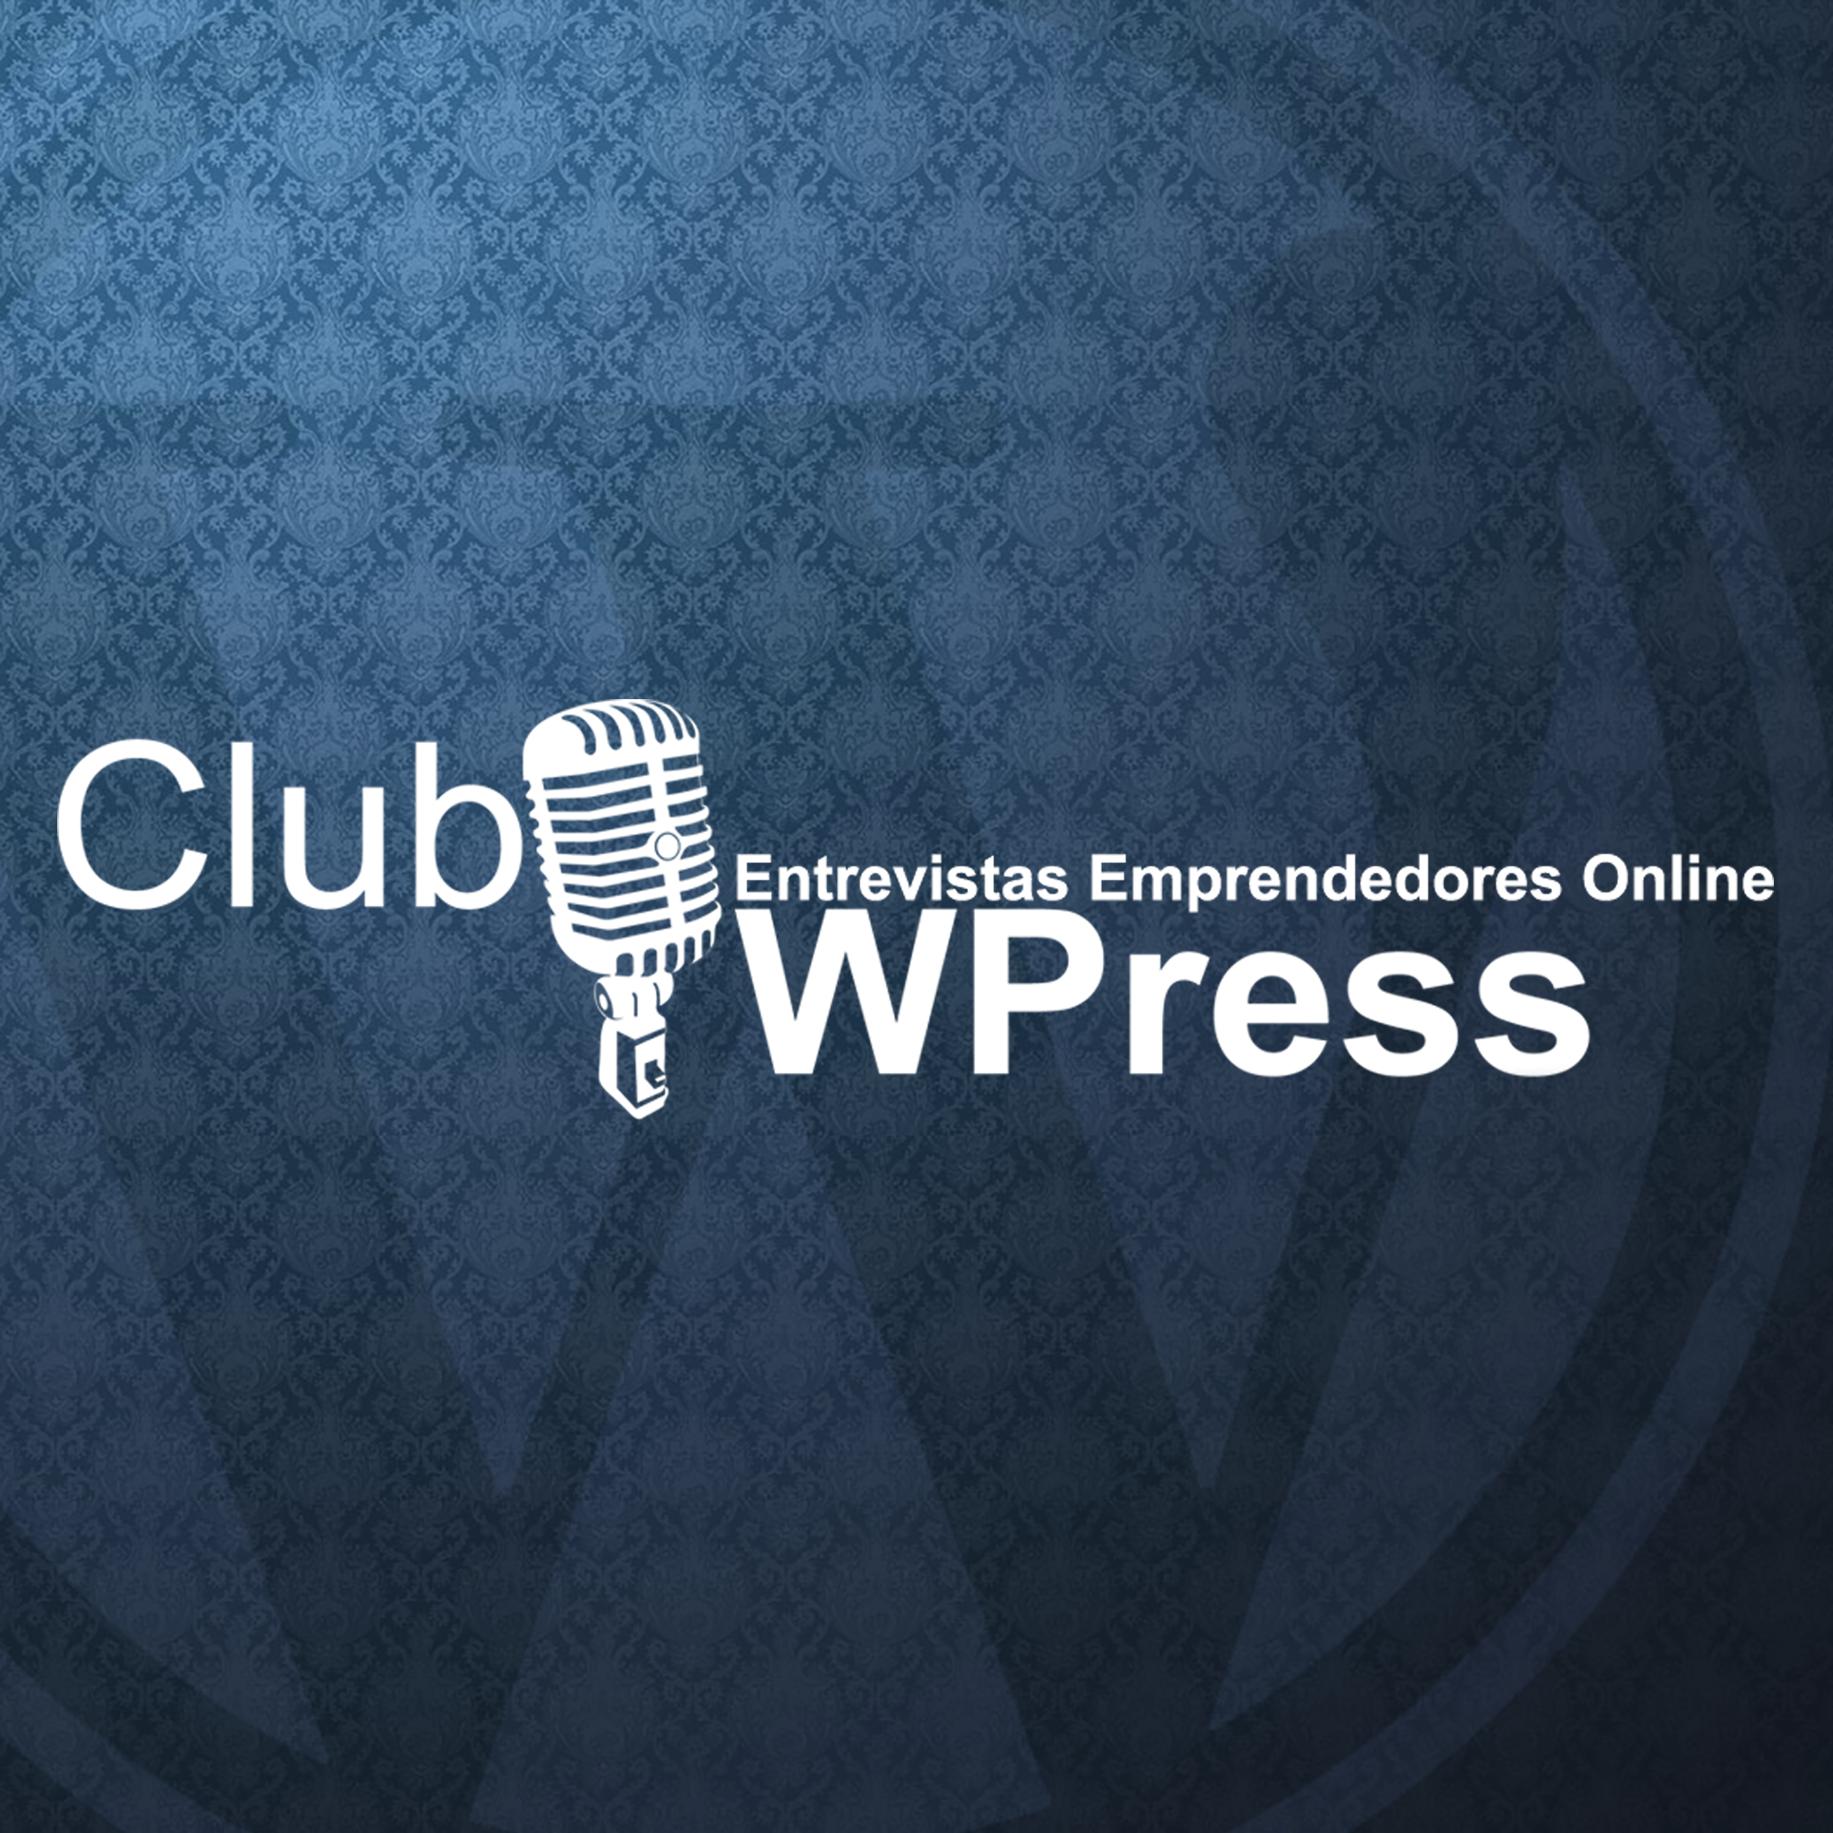 Entrevistas Emprendedores Online | Club WordPress